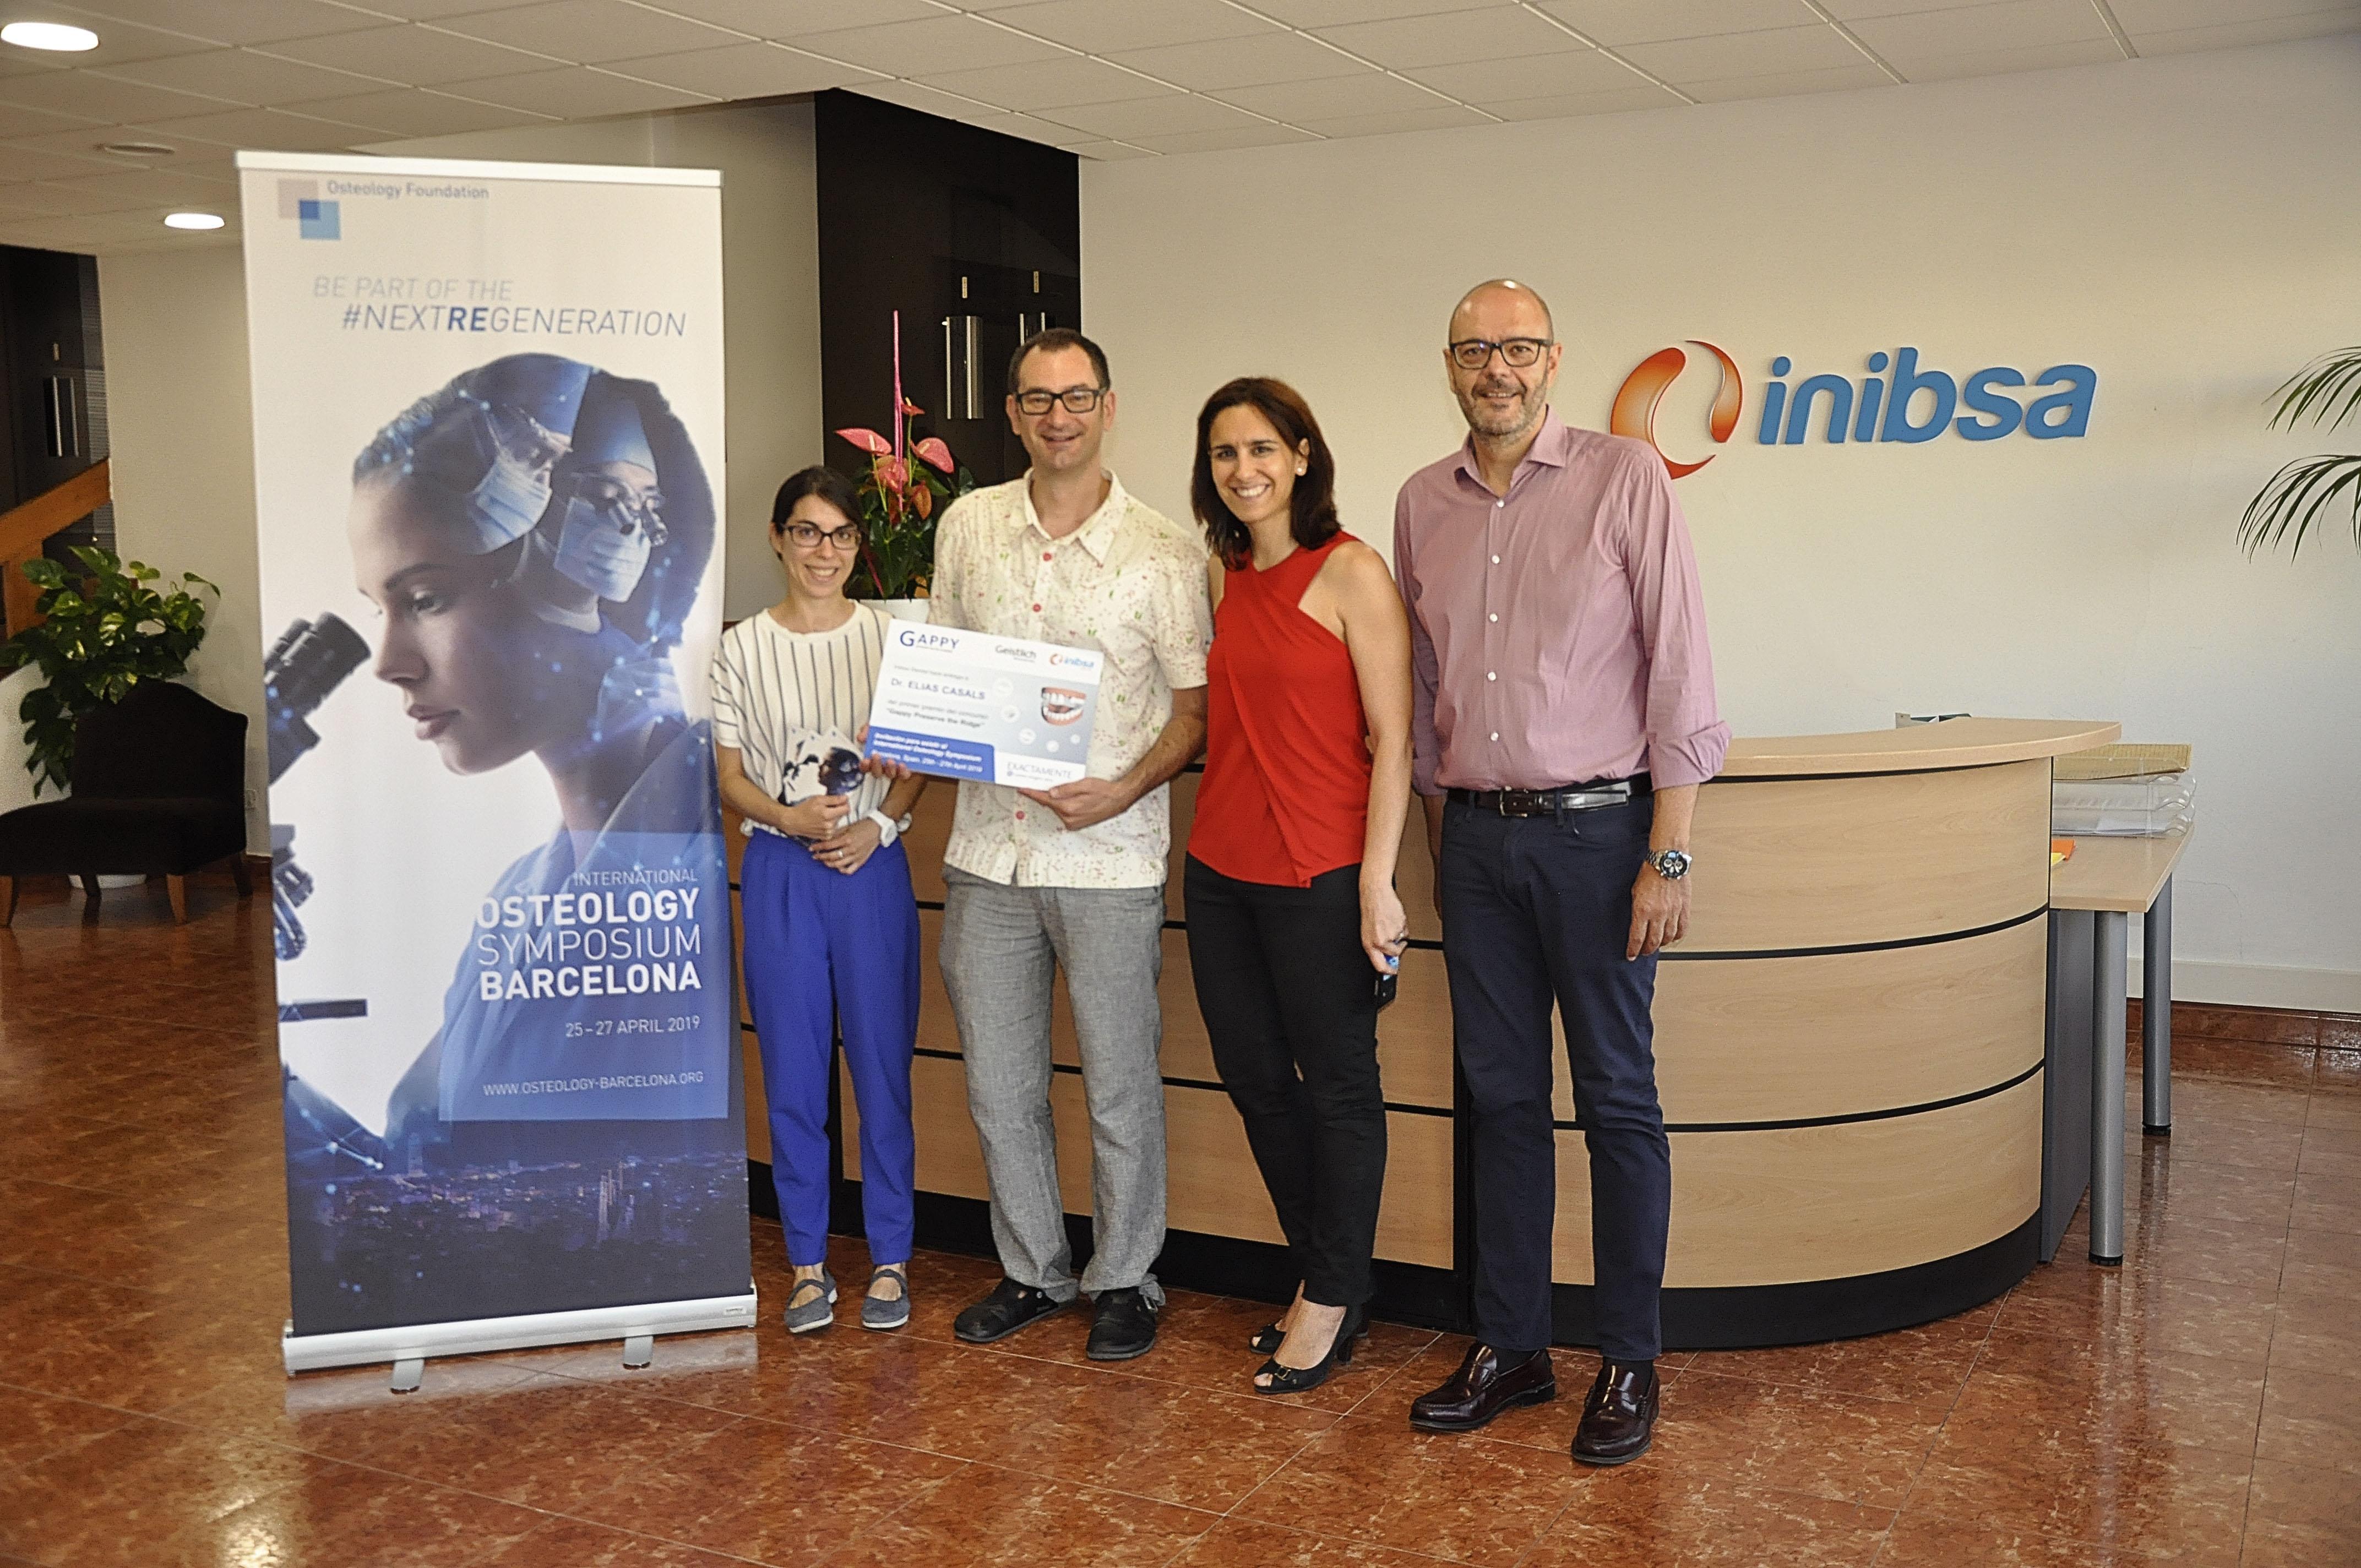 Inibsa Dental lliura el primer premi del concurs Gappy de Geistlich Pharma AG al Dr. Elias Casals